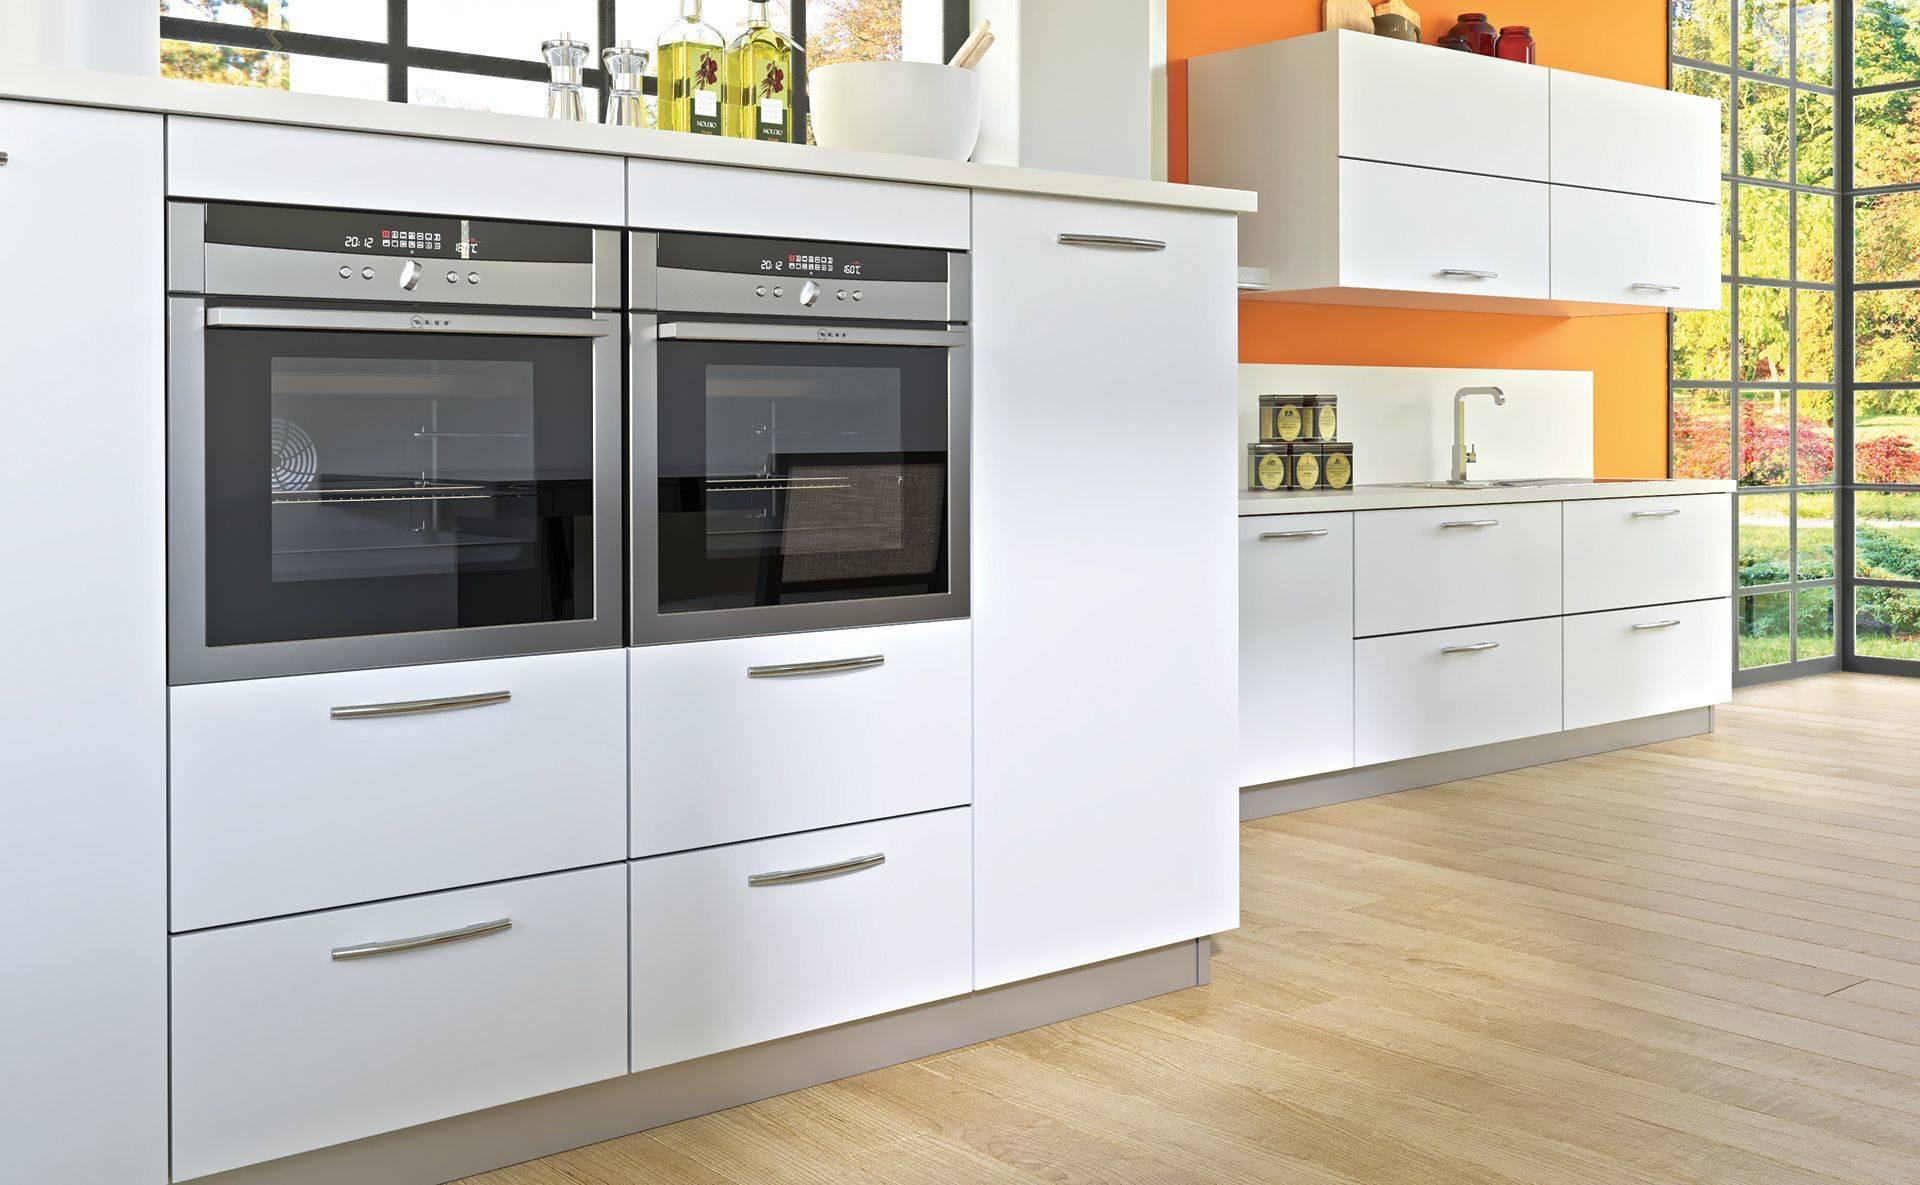 cuisine malaga blanc atypique quip e et sur mesure par cuisines teisseire. Black Bedroom Furniture Sets. Home Design Ideas